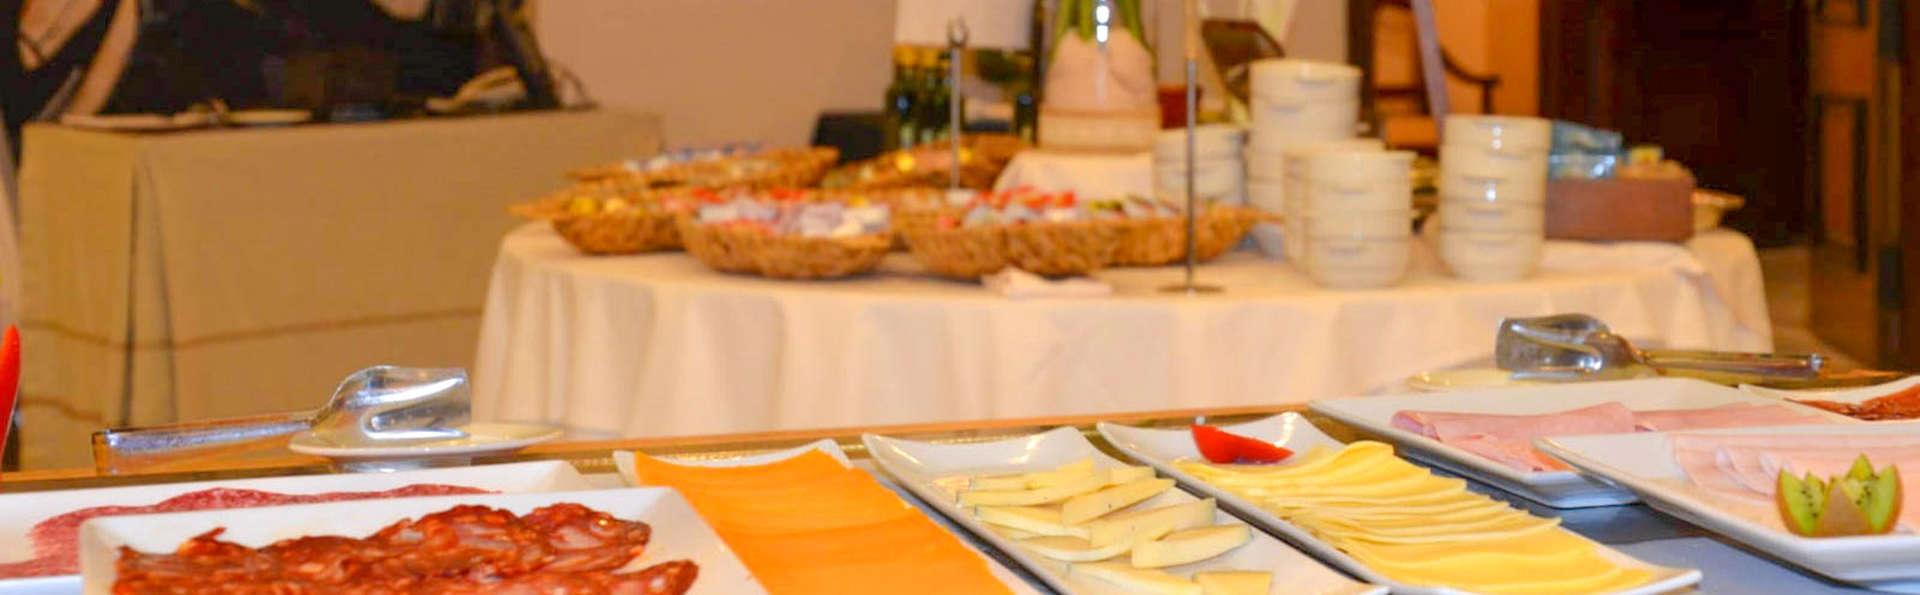 Hotel Alcázar de la Reina - EDIT_RESTAURANT_01.jpg